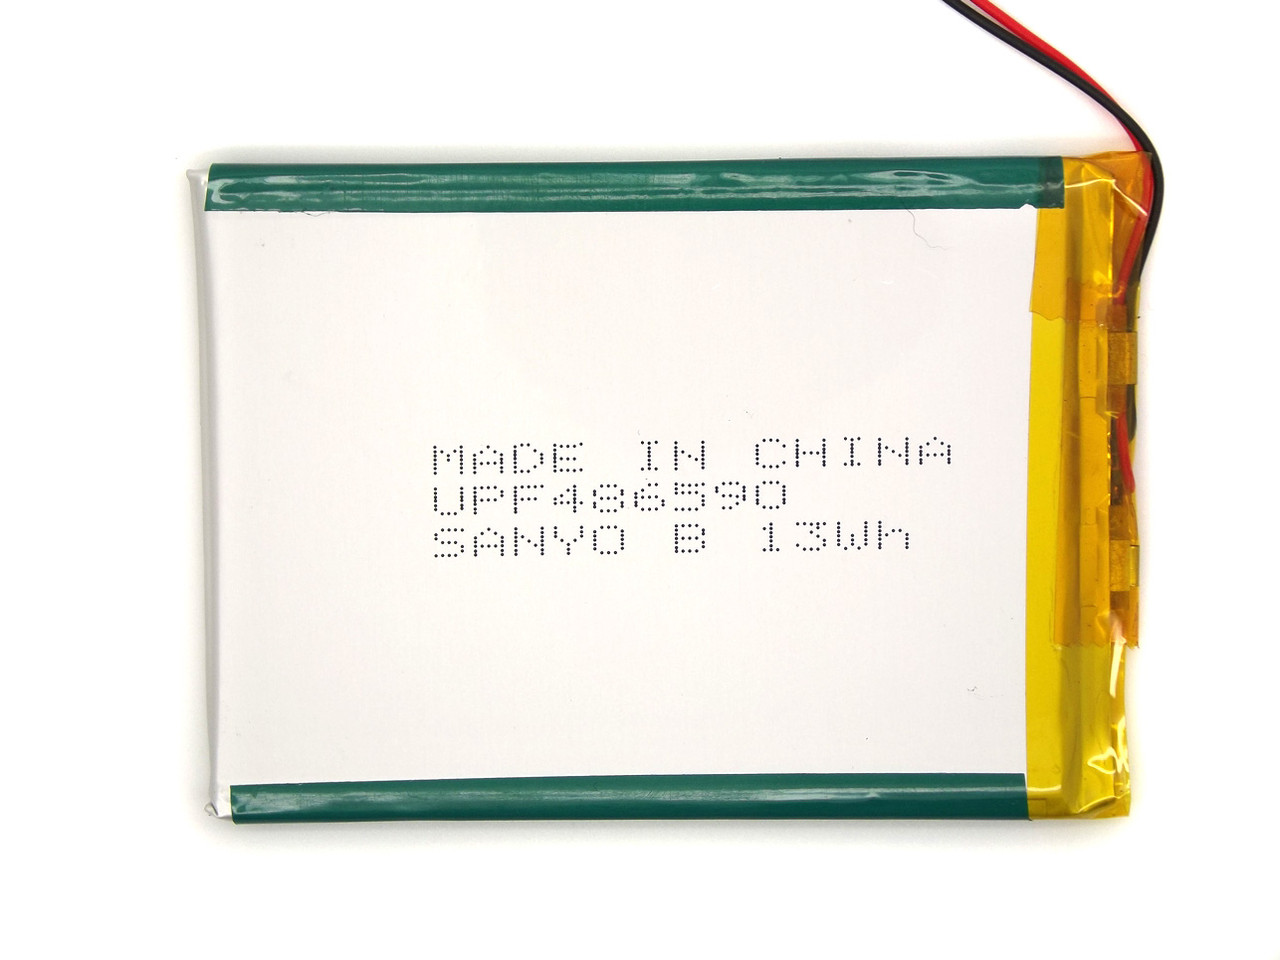 3550mAh 3.7v 456490 НОВЫЙ SANYO Аккумулятор для планшета